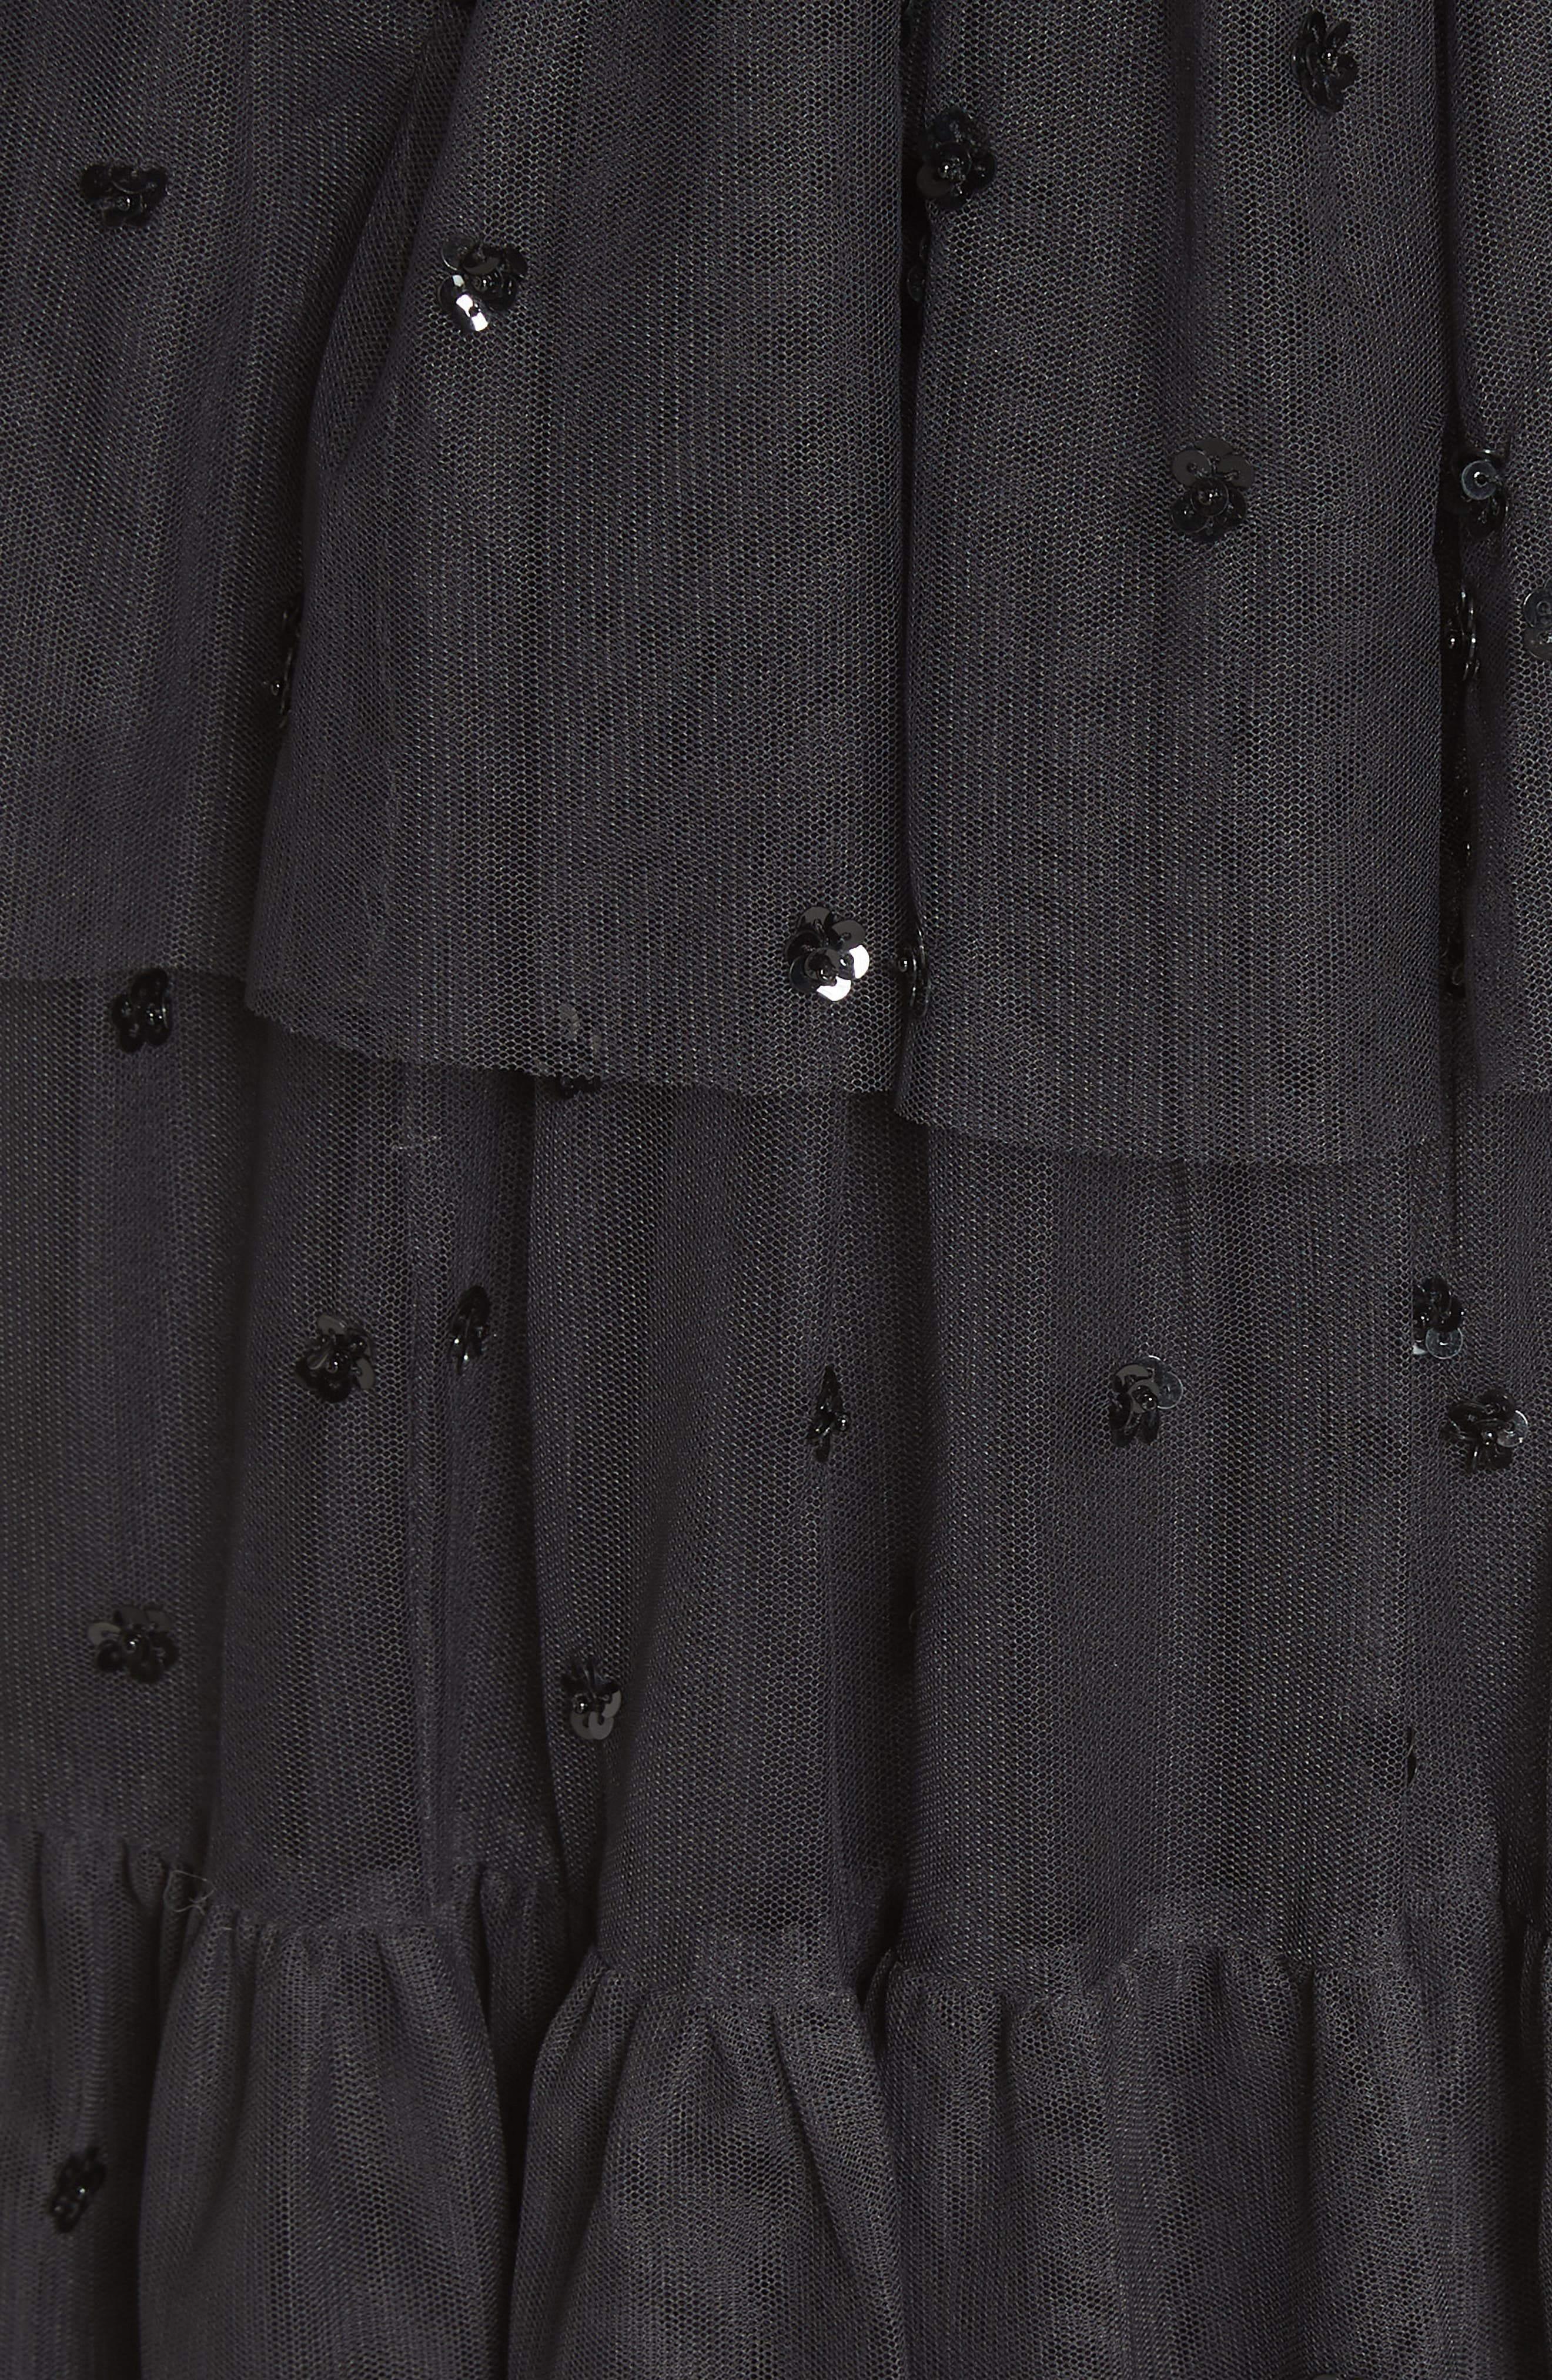 Mirage Sequin Dress,                             Alternate thumbnail 5, color,                             021